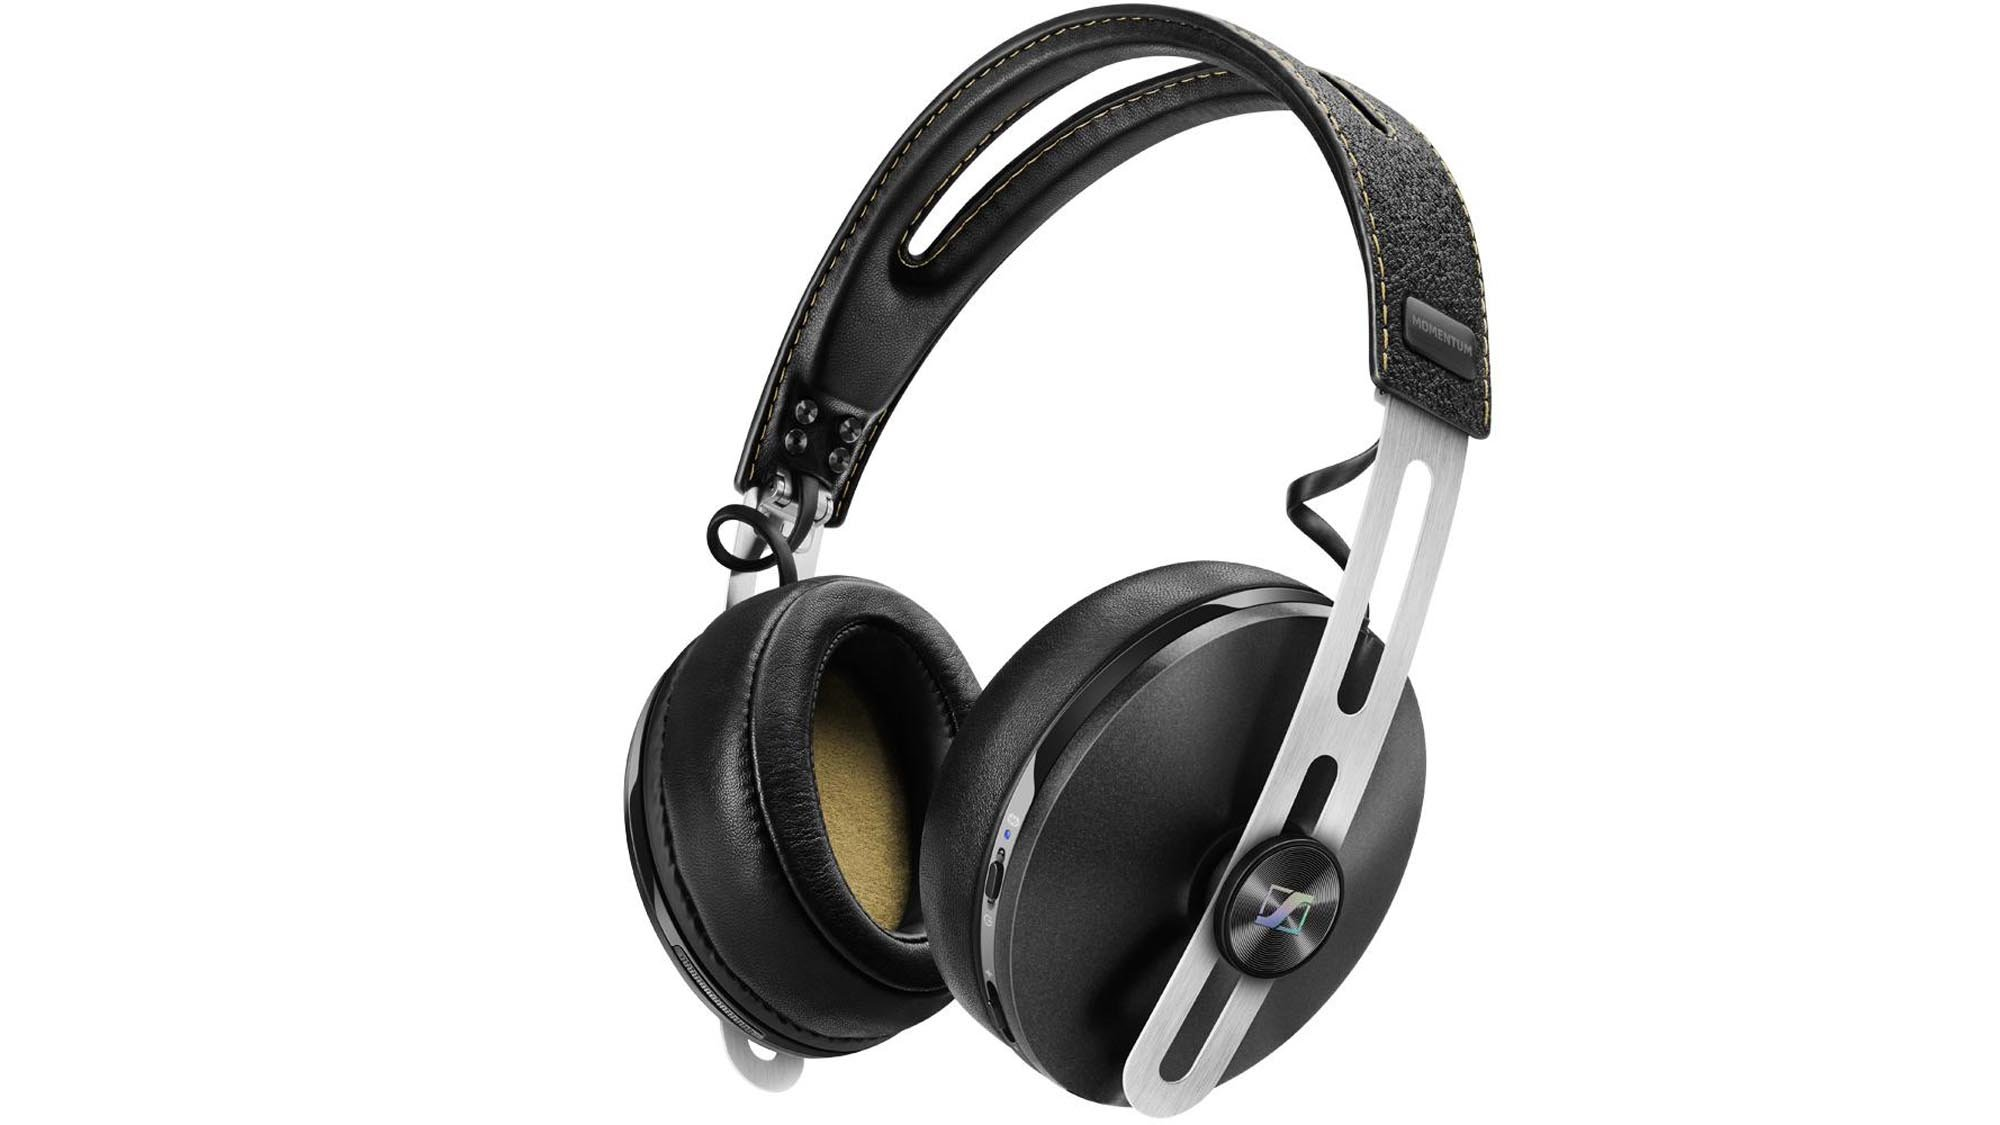 Wireless headphones bose wireless - headphones wireless bose around